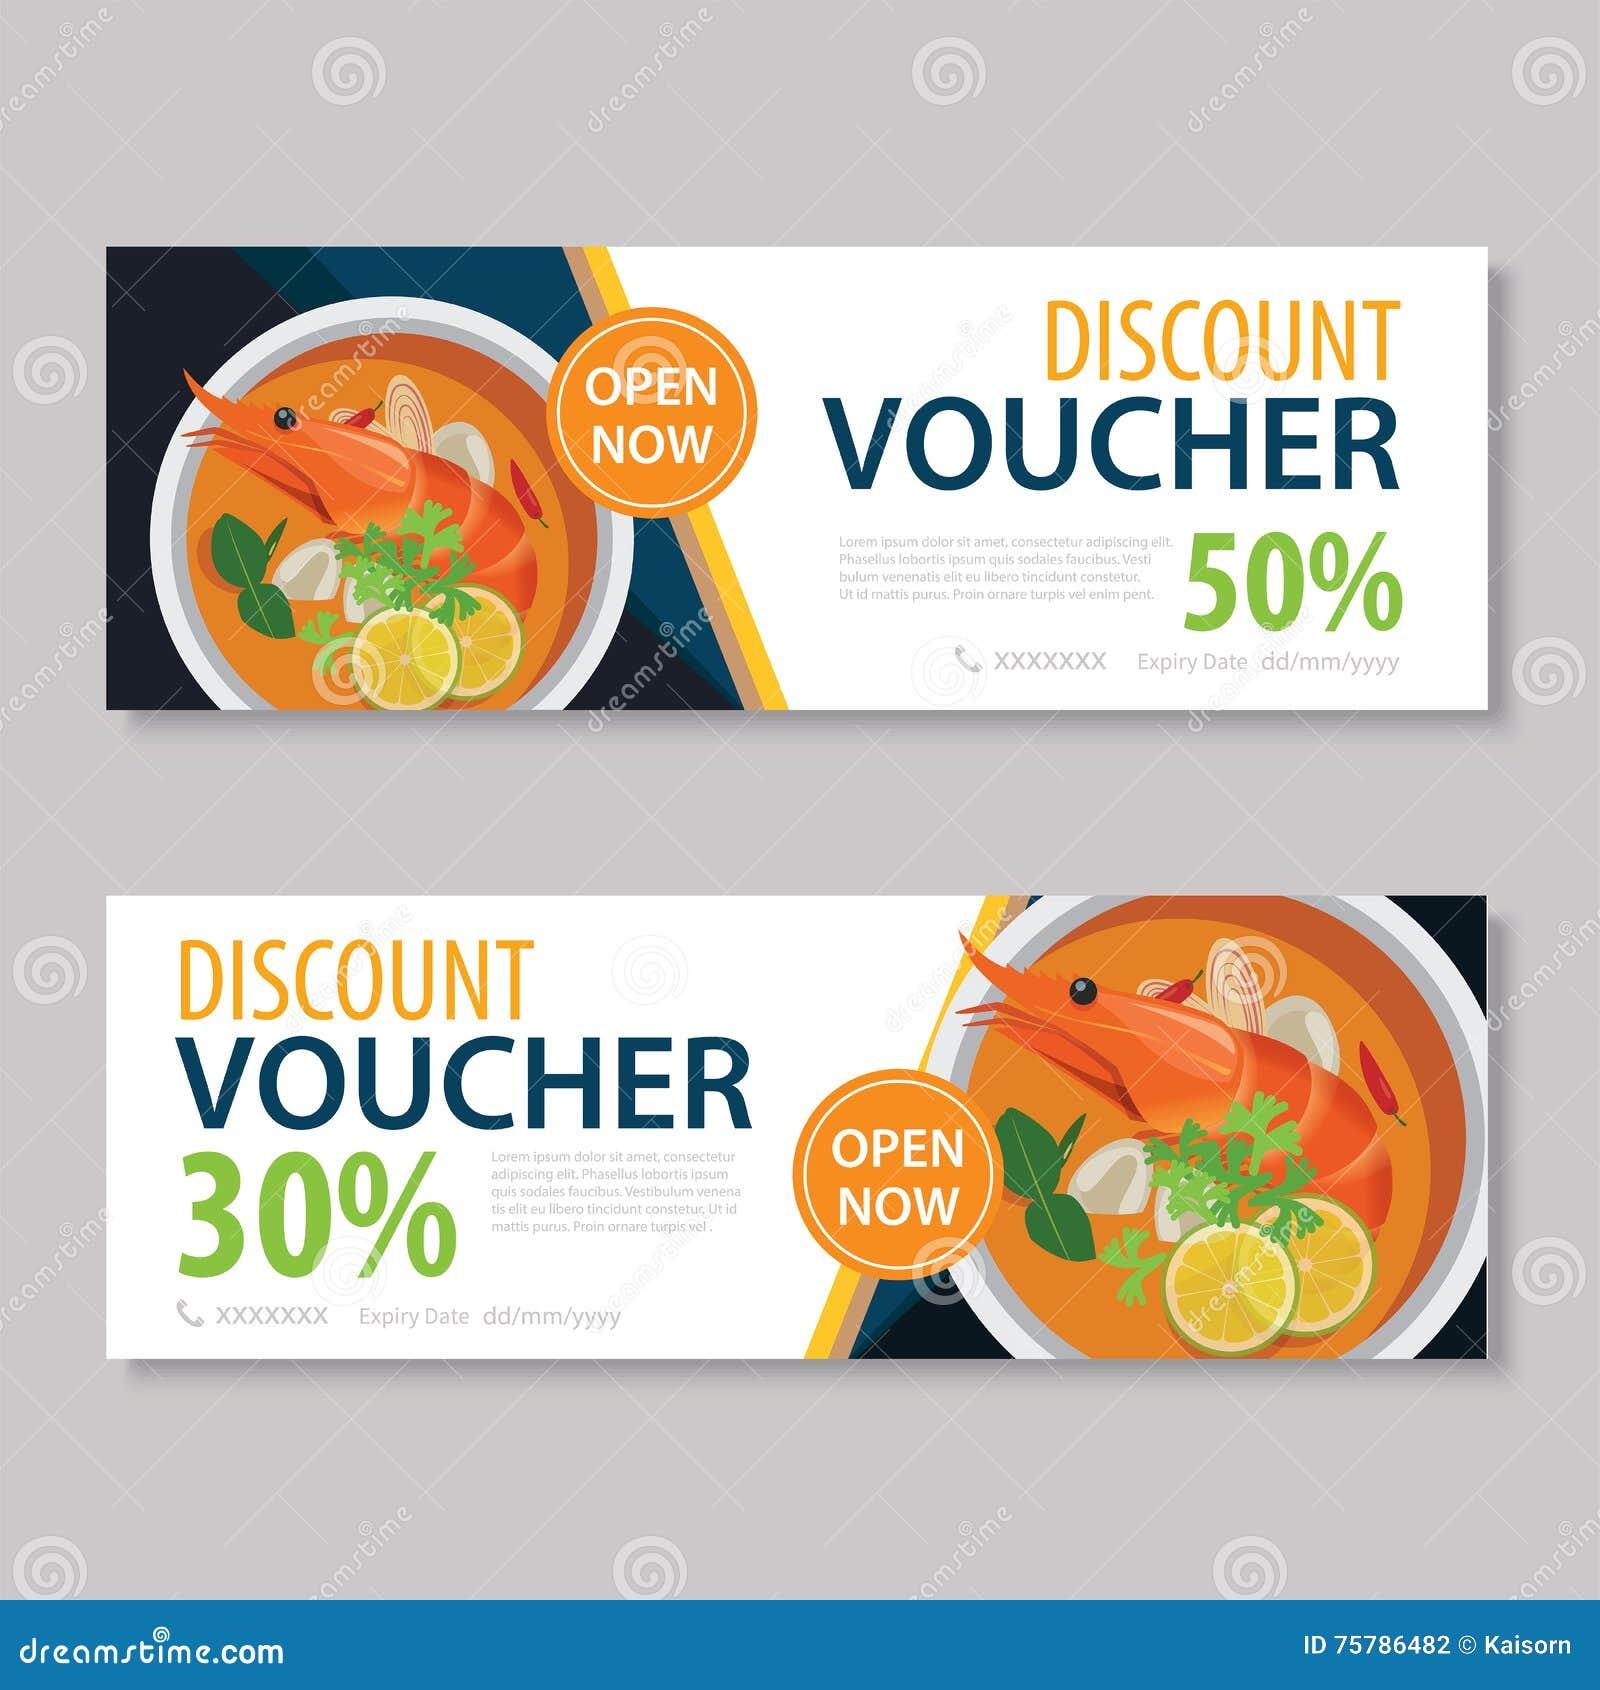 Superior Discount Voucher Template With Thai Food Flat Design. Lunch, Breakfast.